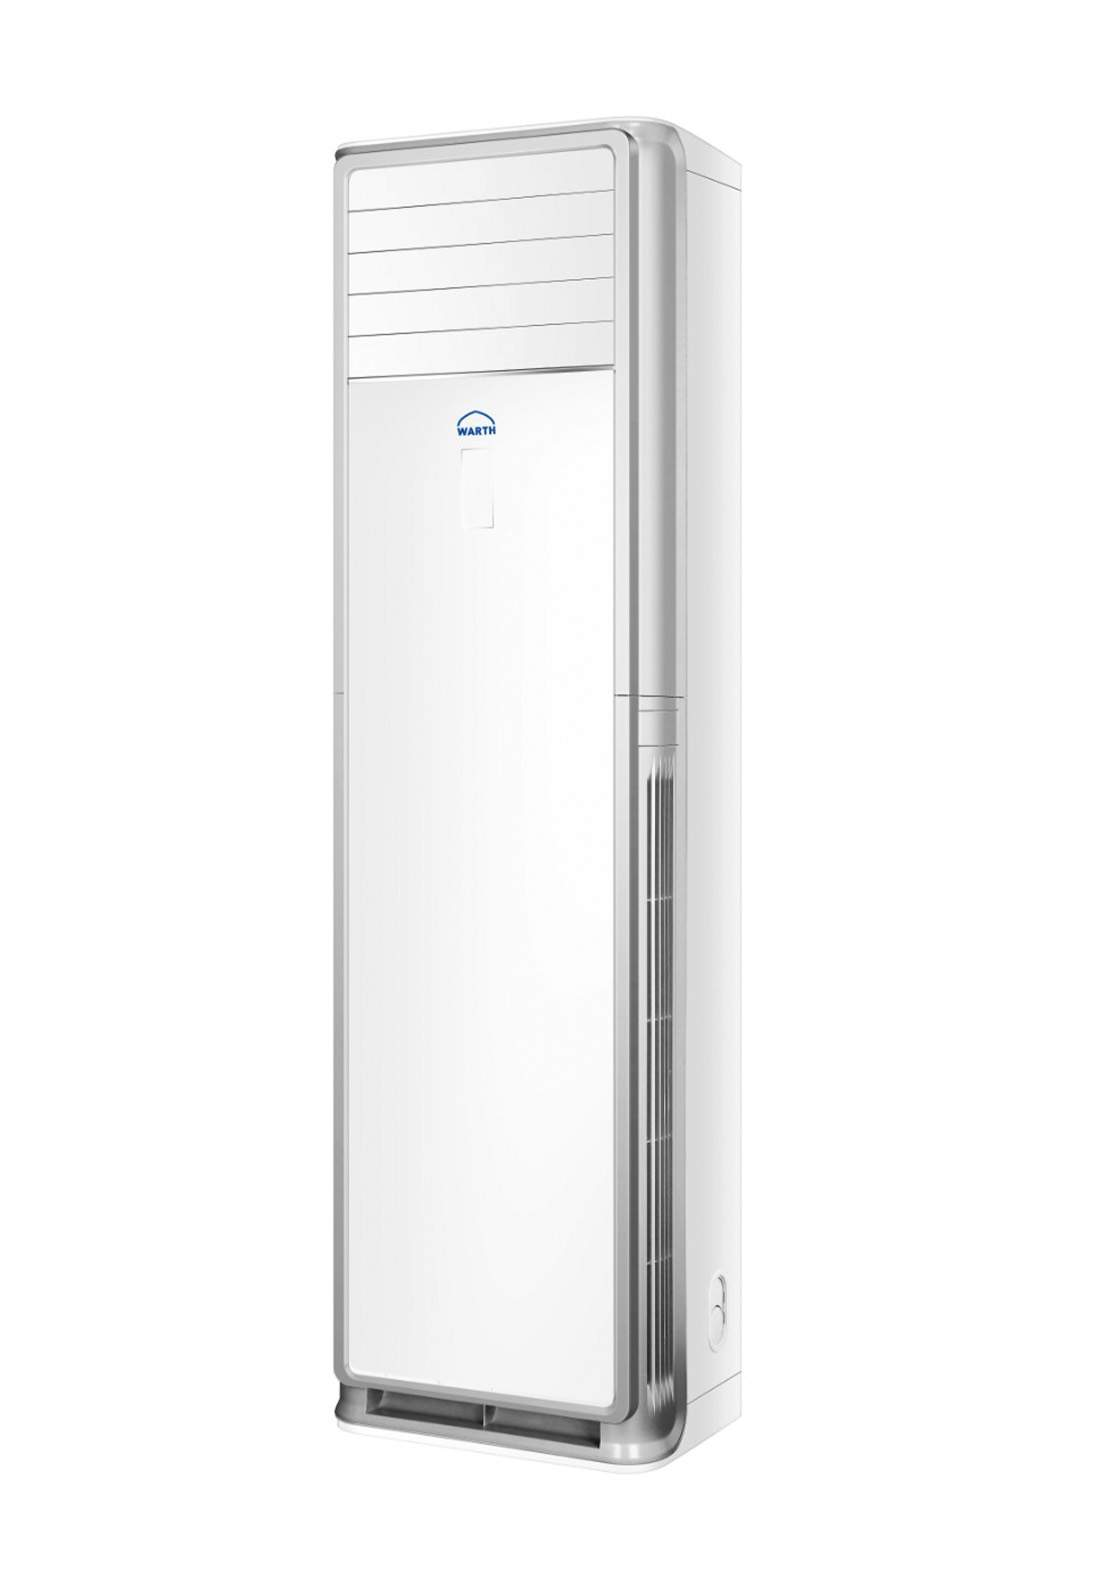 Warth WFS-24-H-T3 Floor Standing Air Conditioner سبلت عامودي 2 طن